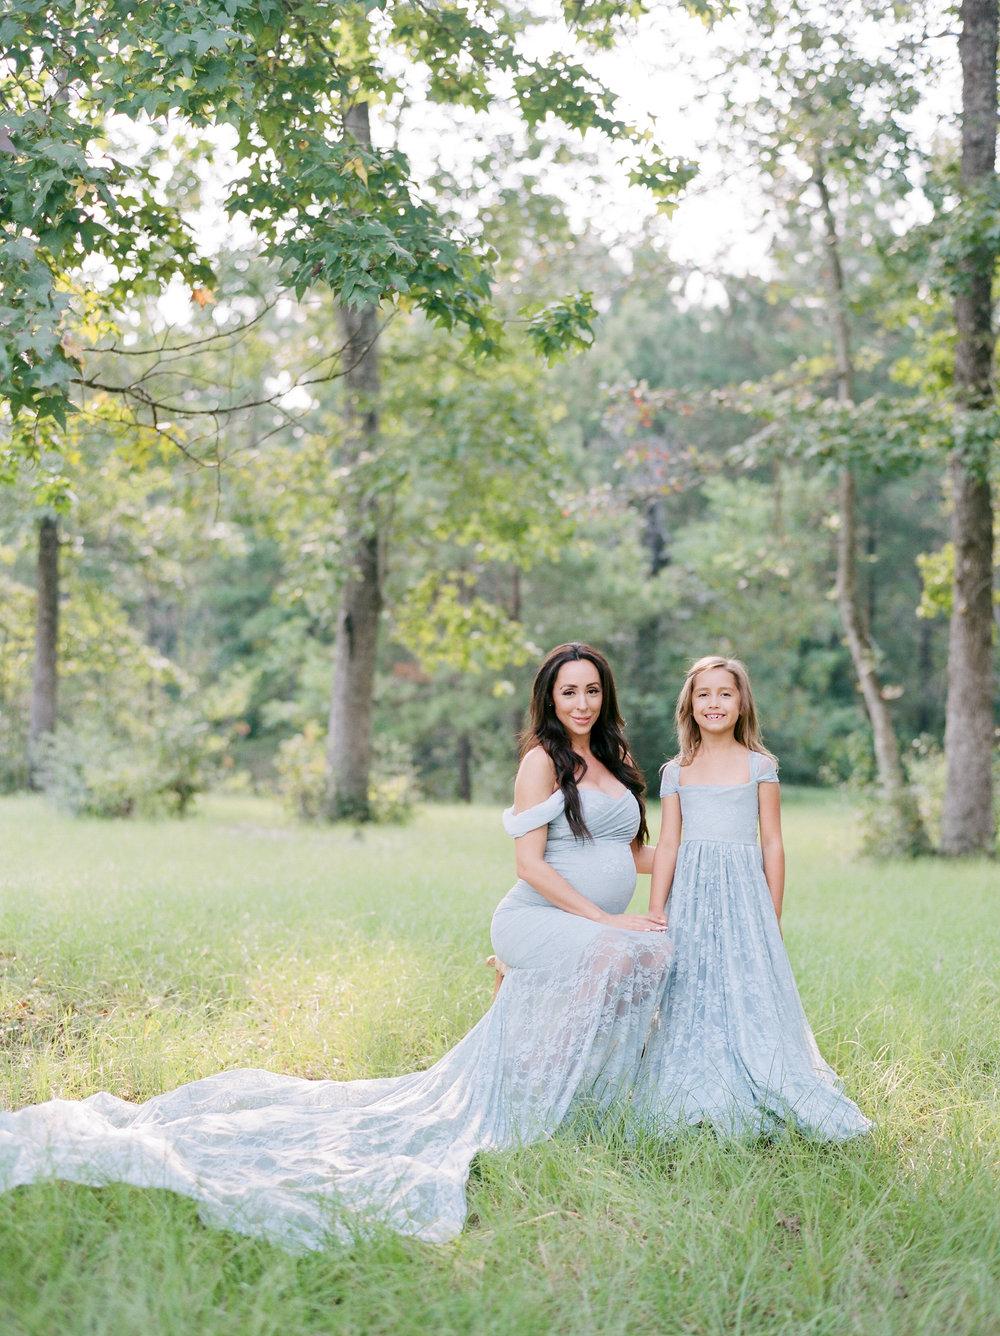 Fine-Art-Film-Houston-Wedding-Photographer-Best-Top-Luxury-Texas-Austin-Dallas-Destination-Dana-Fernandez-Photography-Portrait-Mommy-and-Me-Session-3.jpg